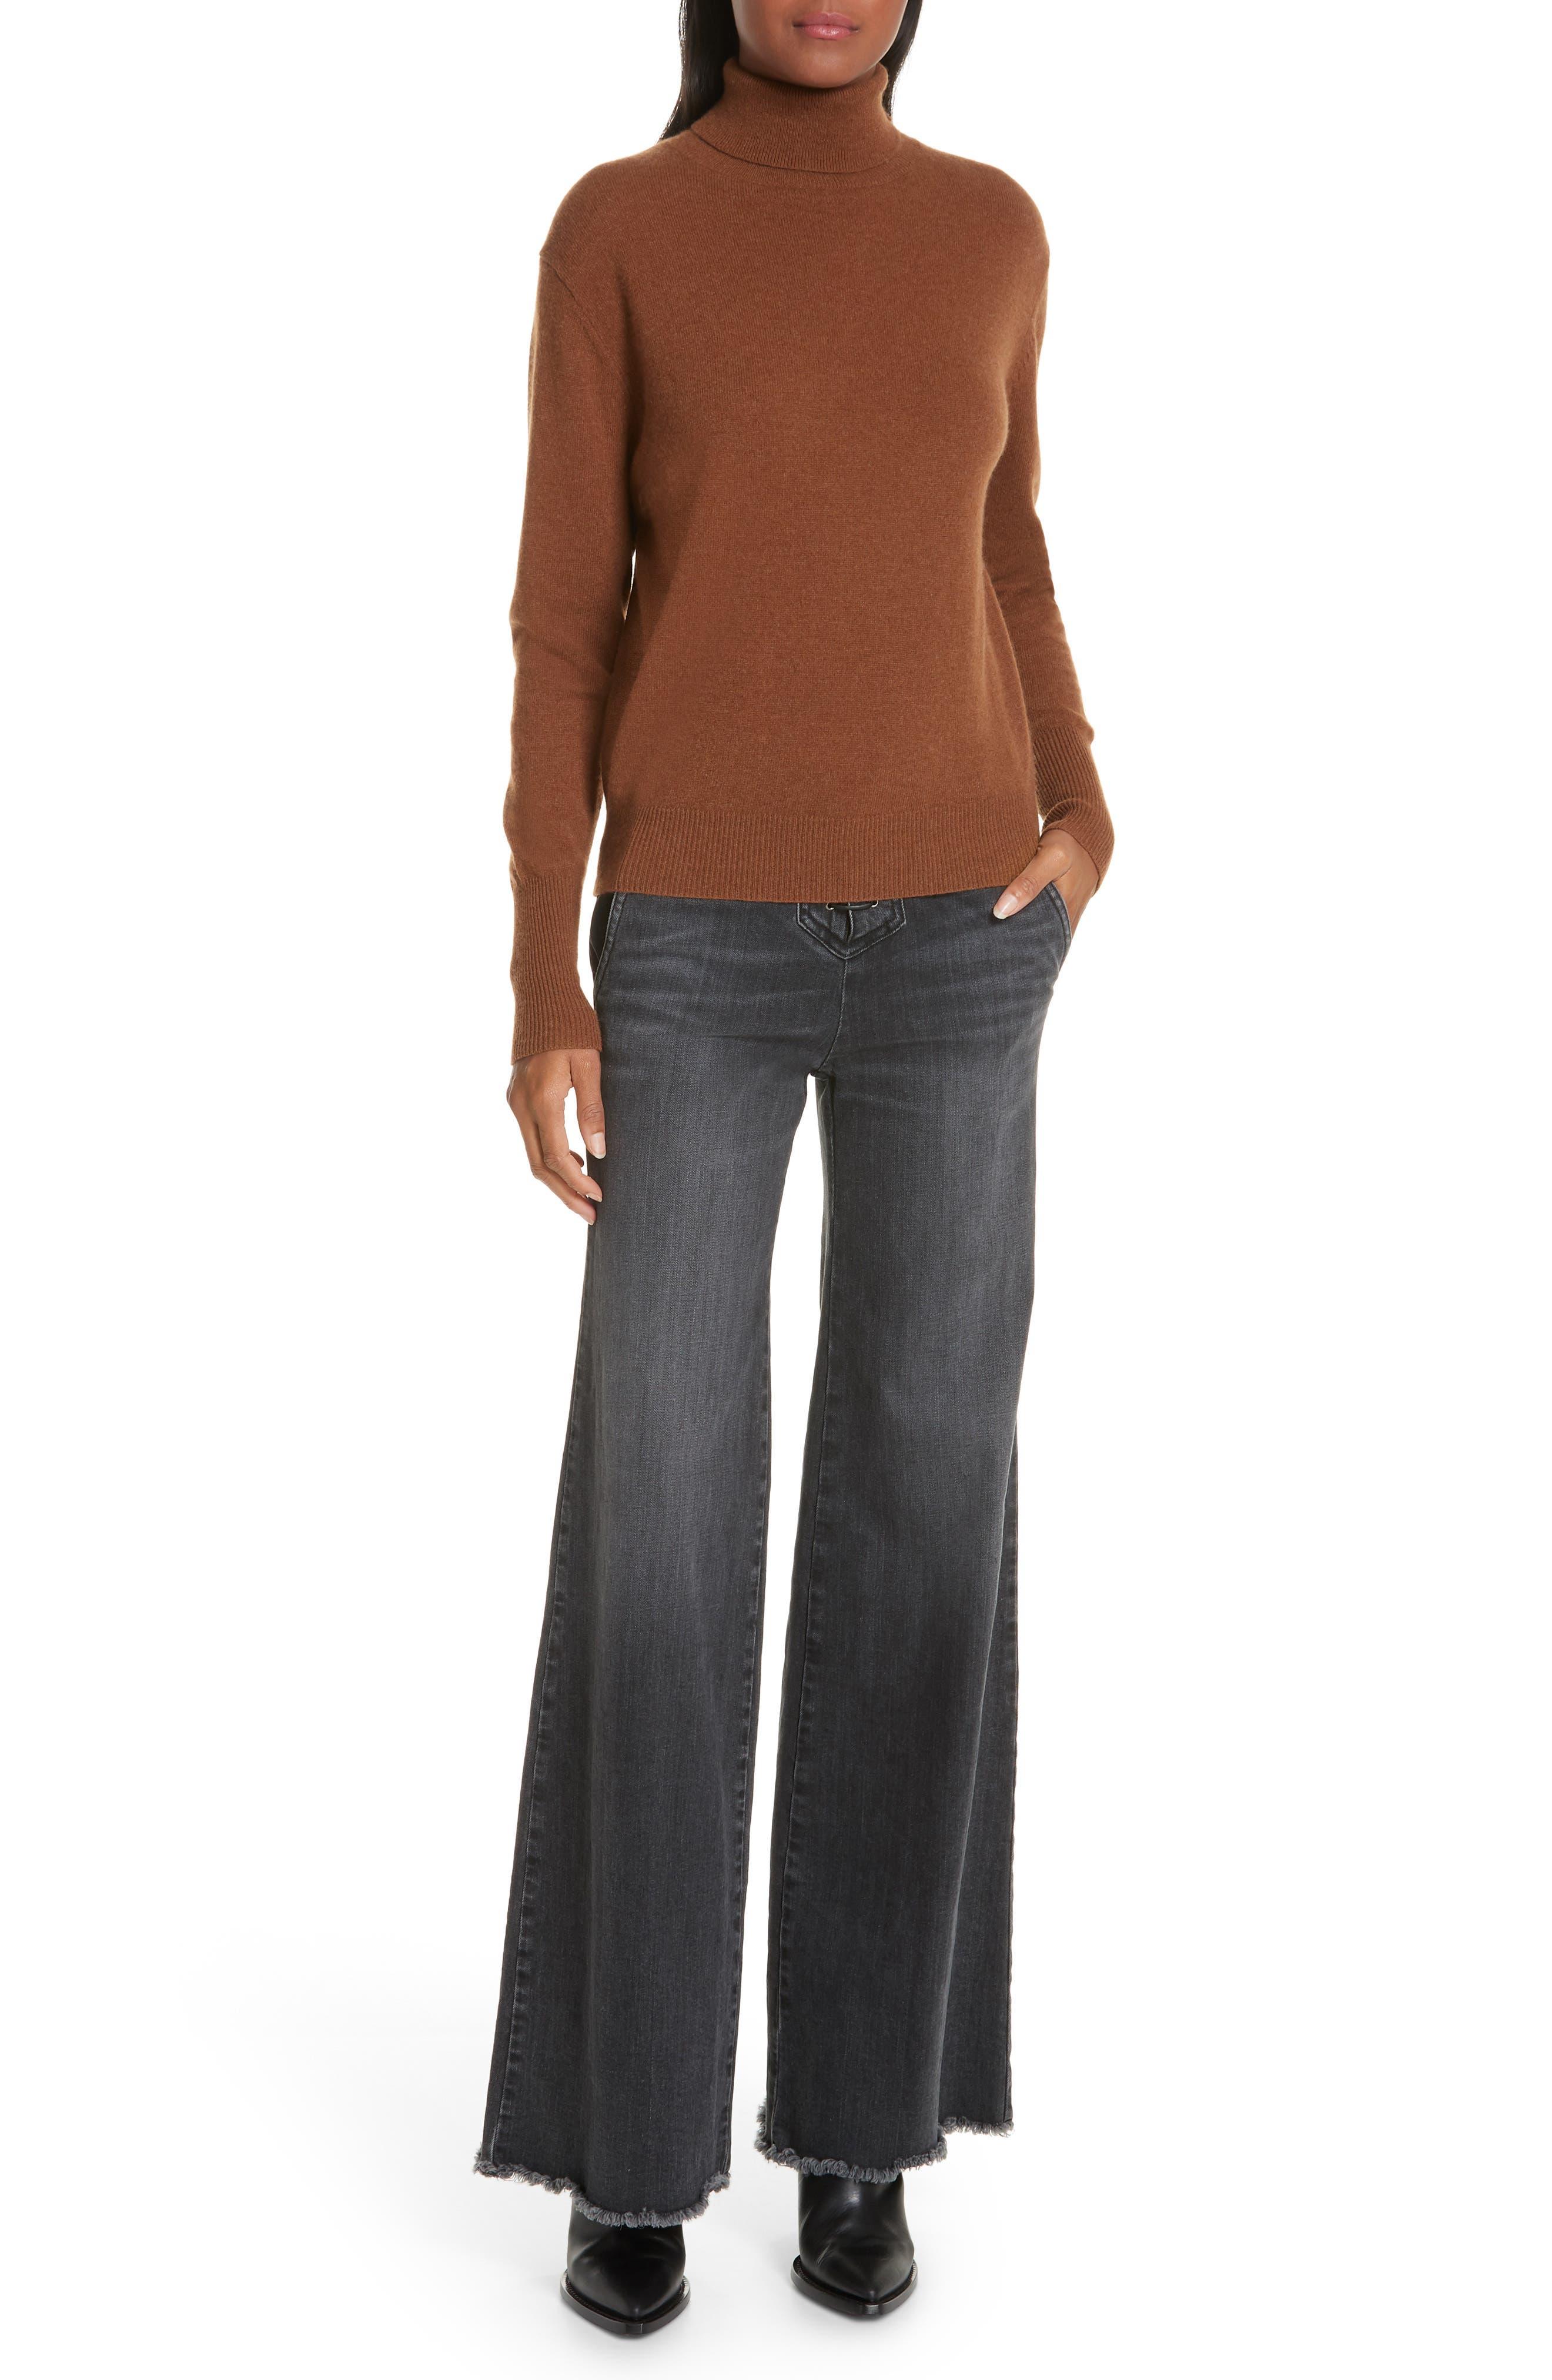 NILI LOTAN, Ralphie Cashmere Turtleneck Sweater, Alternate thumbnail 7, color, COGNAC